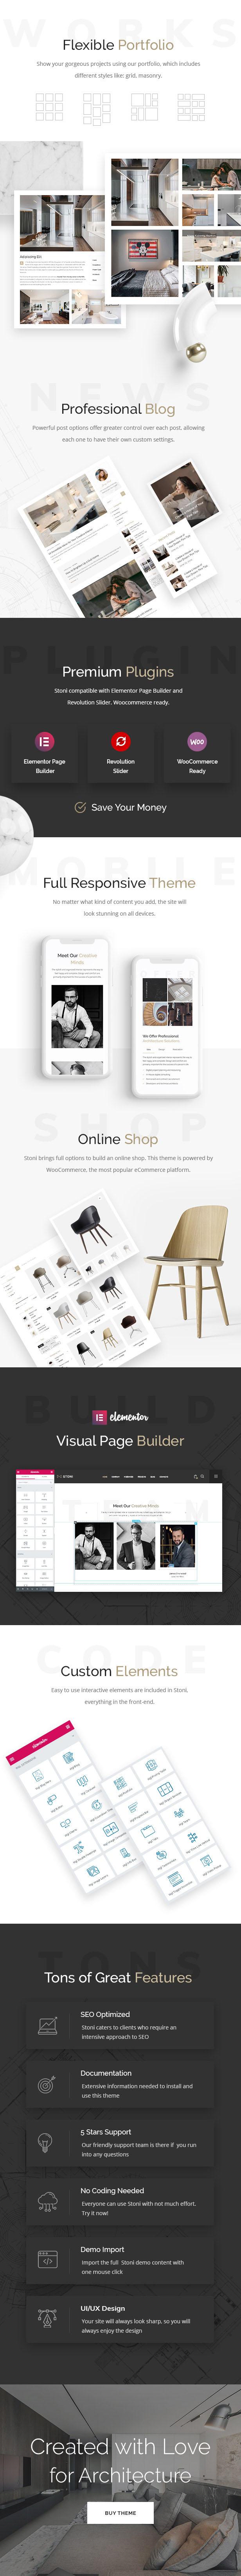 Stoni - Architecture Agency WordPress Theme - 2